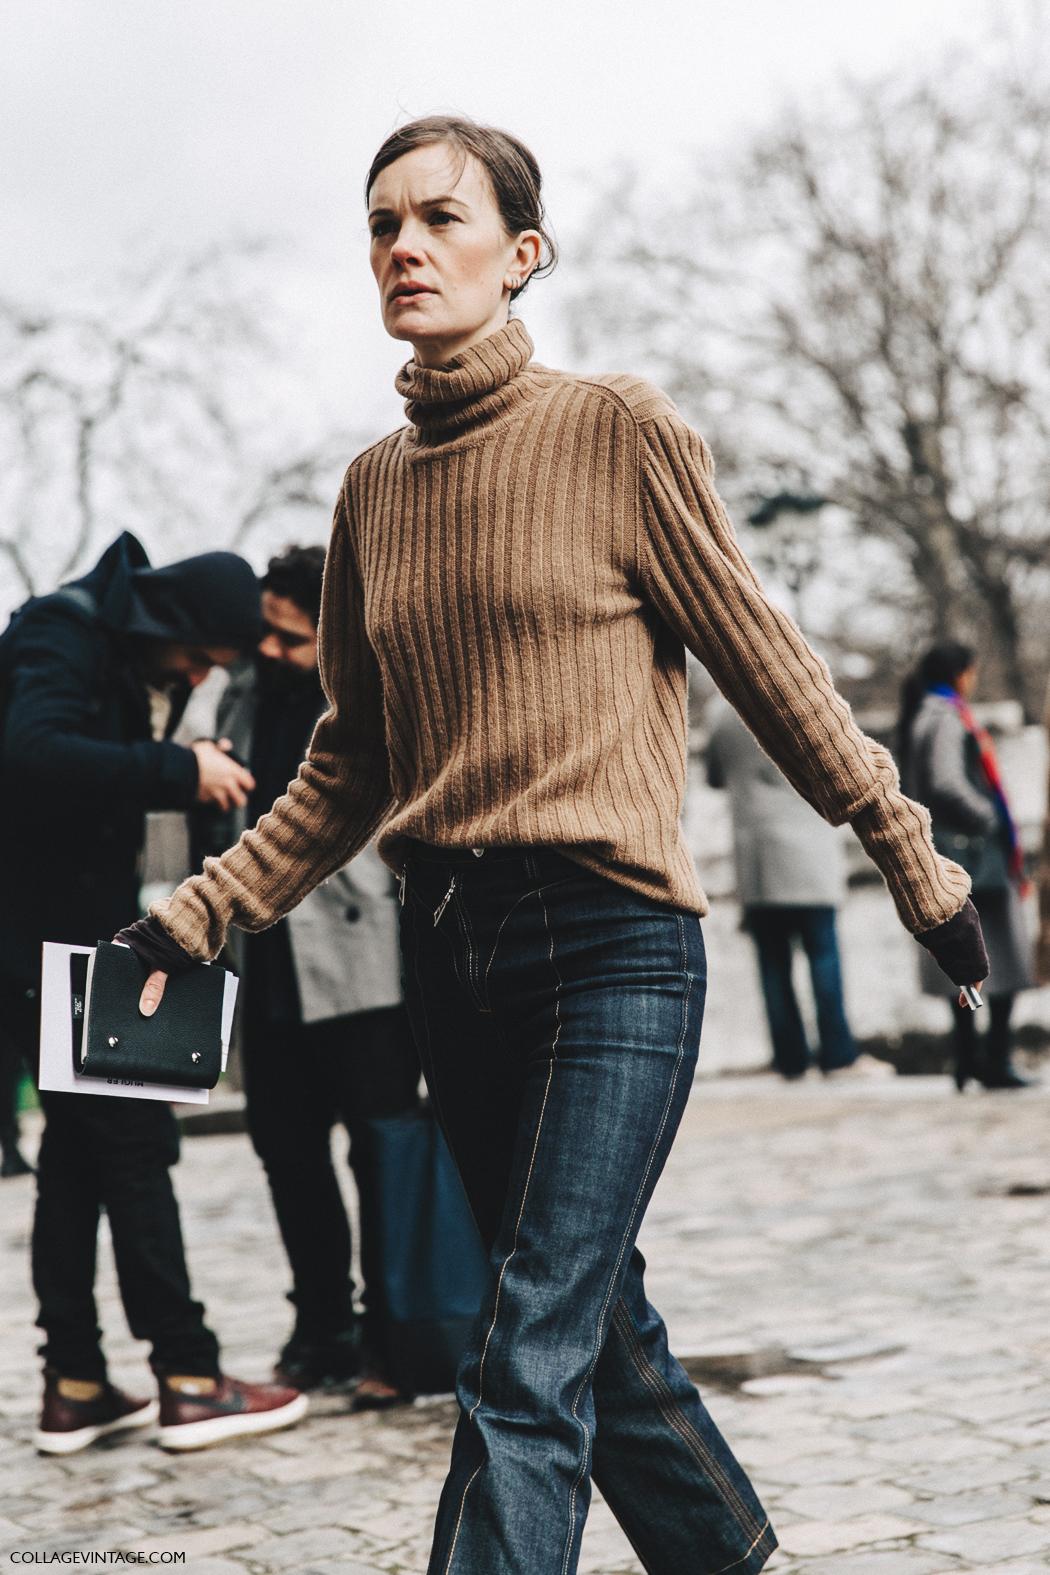 PFW-Paris_Fashion_Week_Fall_2016-Street_Style-Collage_Vintage-Jo_Ellison-Louis_Vuitton-